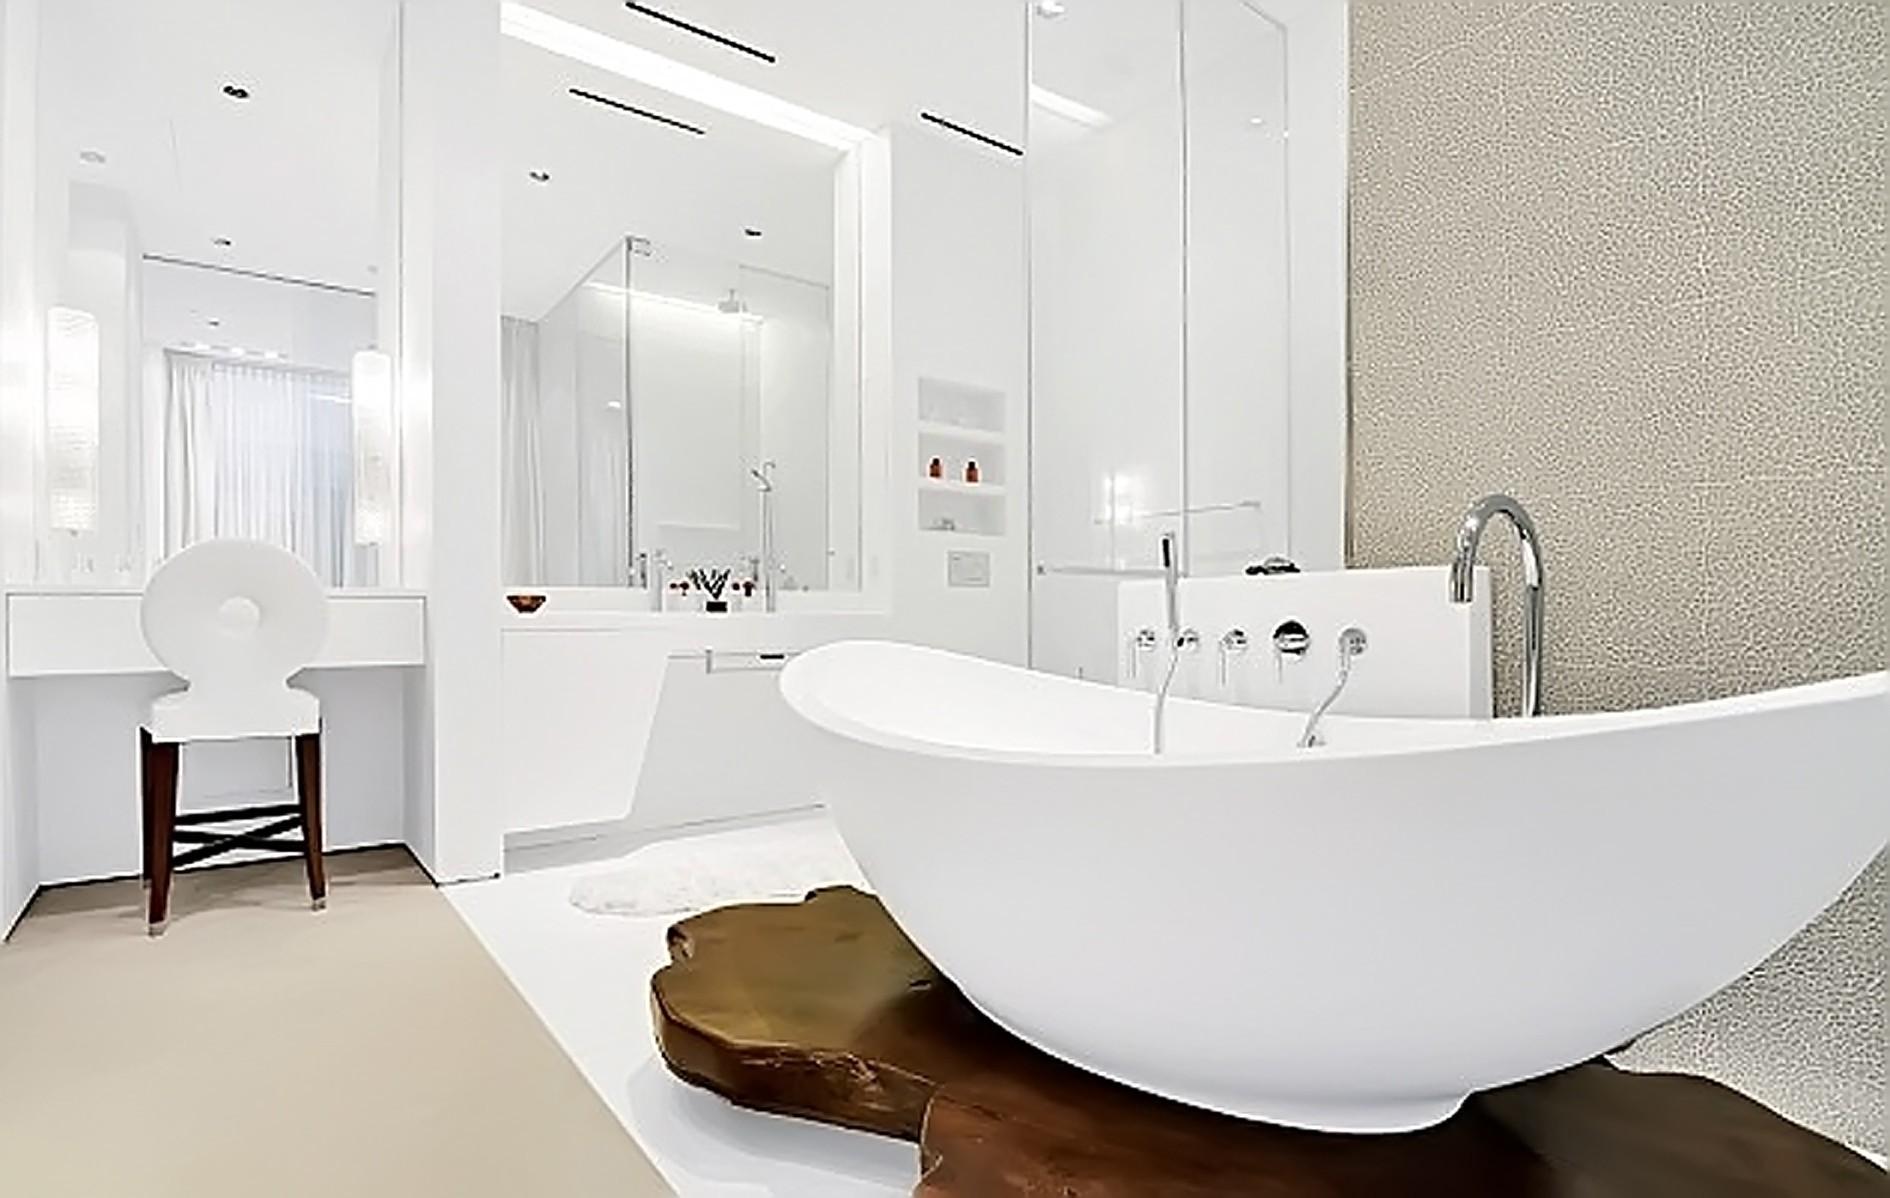 Ванная комната Ирины. Фото: EAST NEWS.